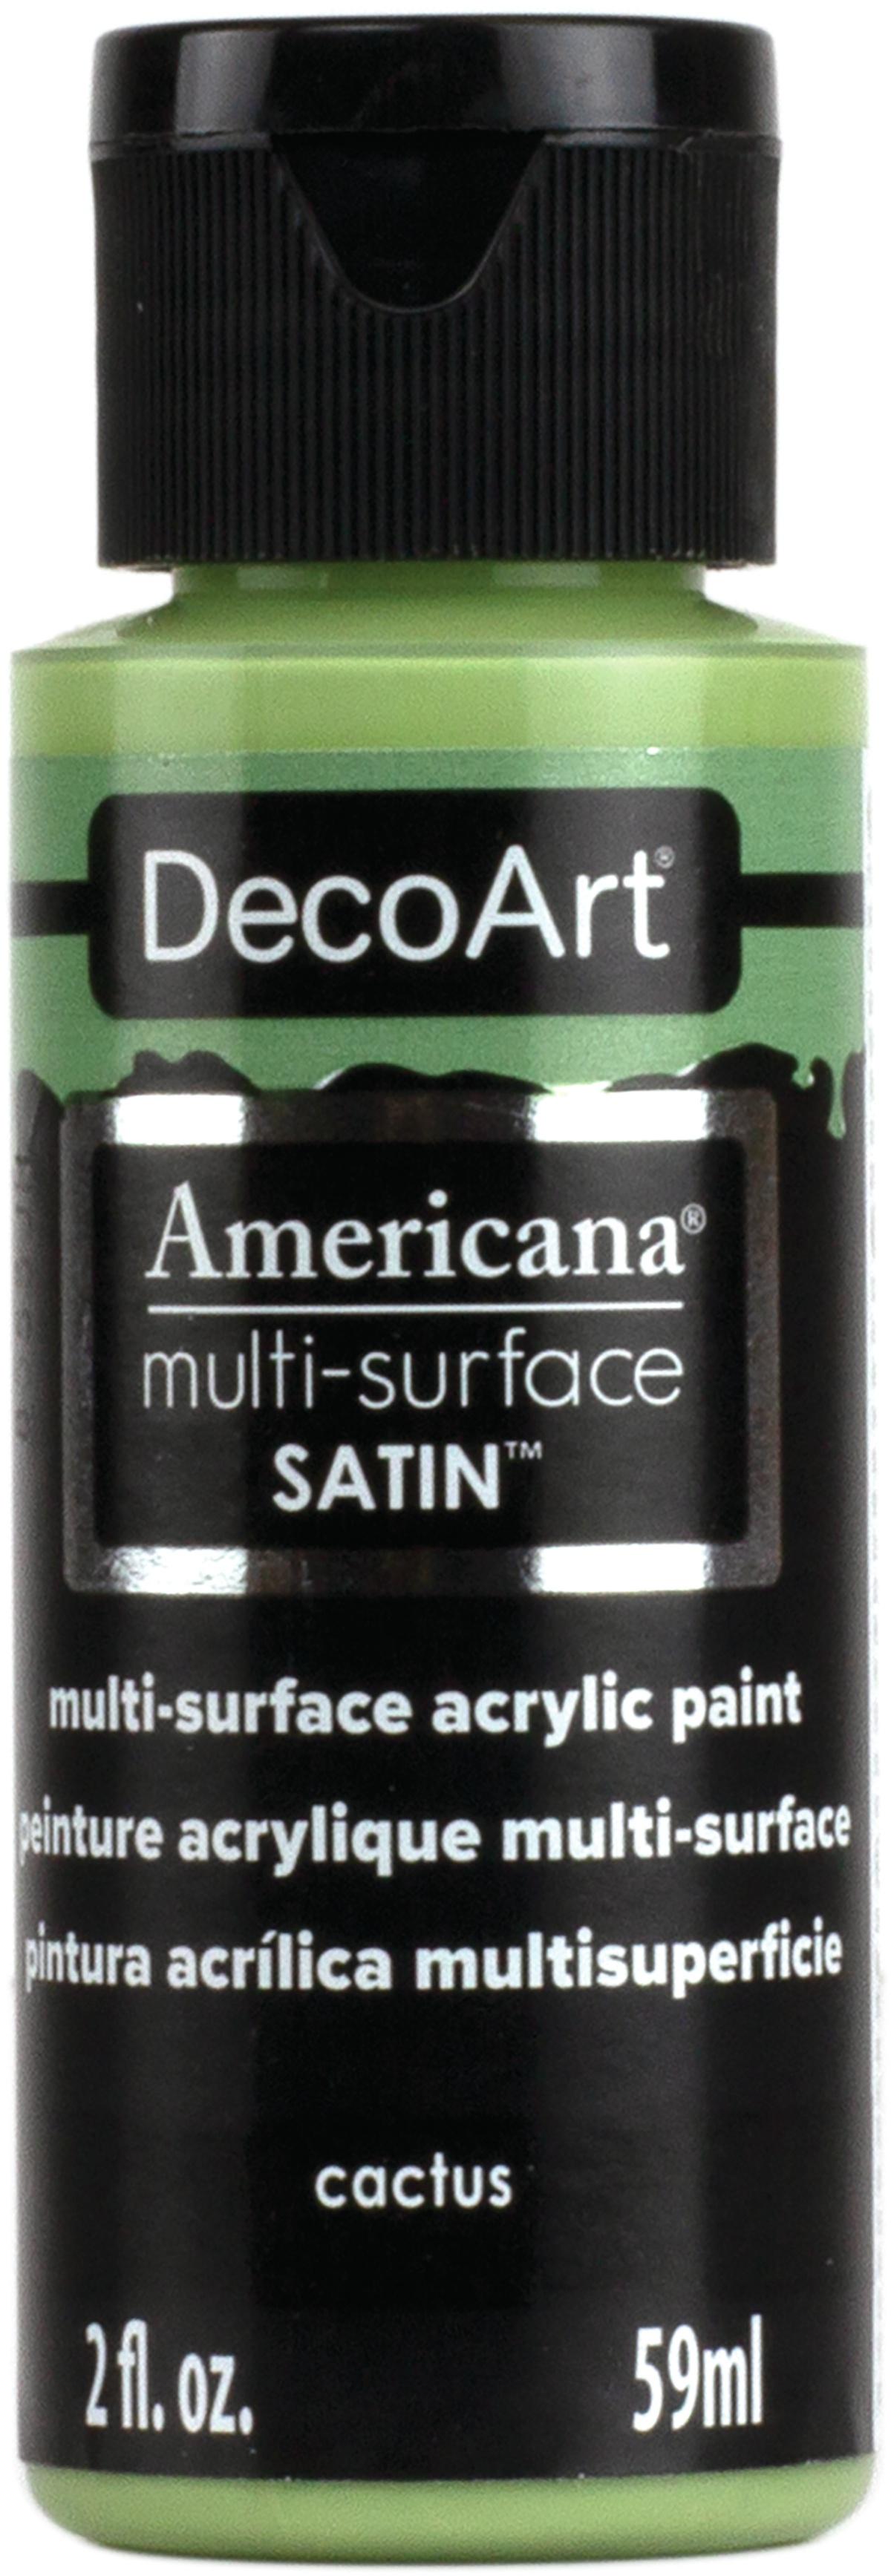 Americana Multi-Surface Satin Acrylic Paint 2oz-Cactus